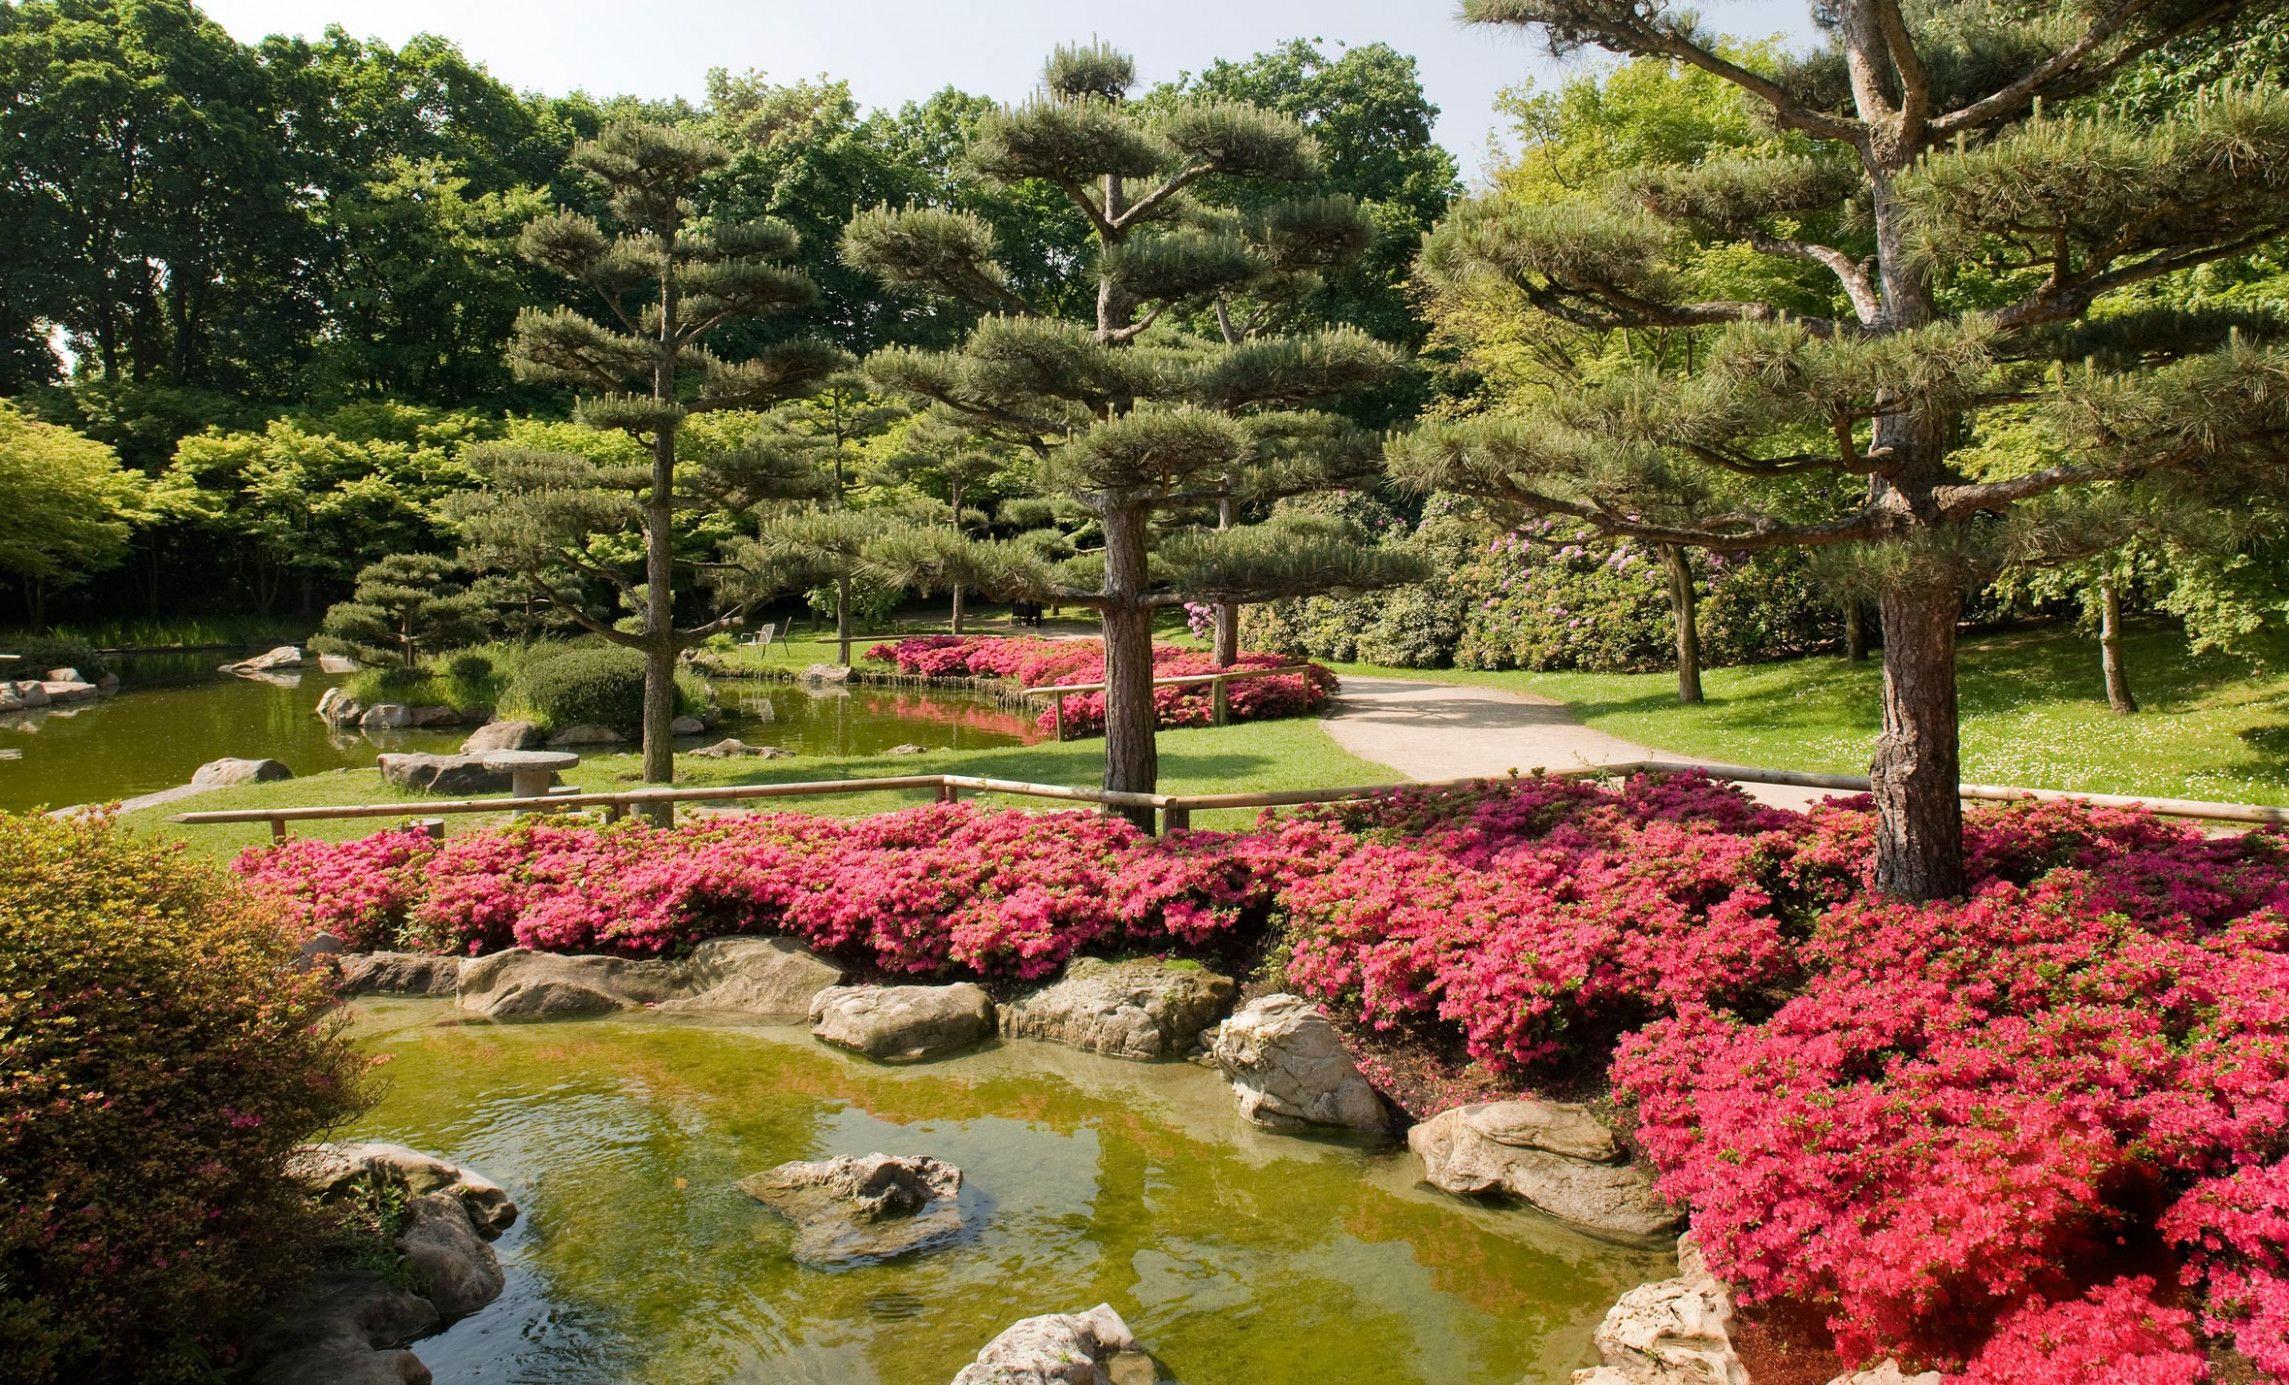 Japanischer Garten Deutschland Japanischer Garten Garten Garten Ideen